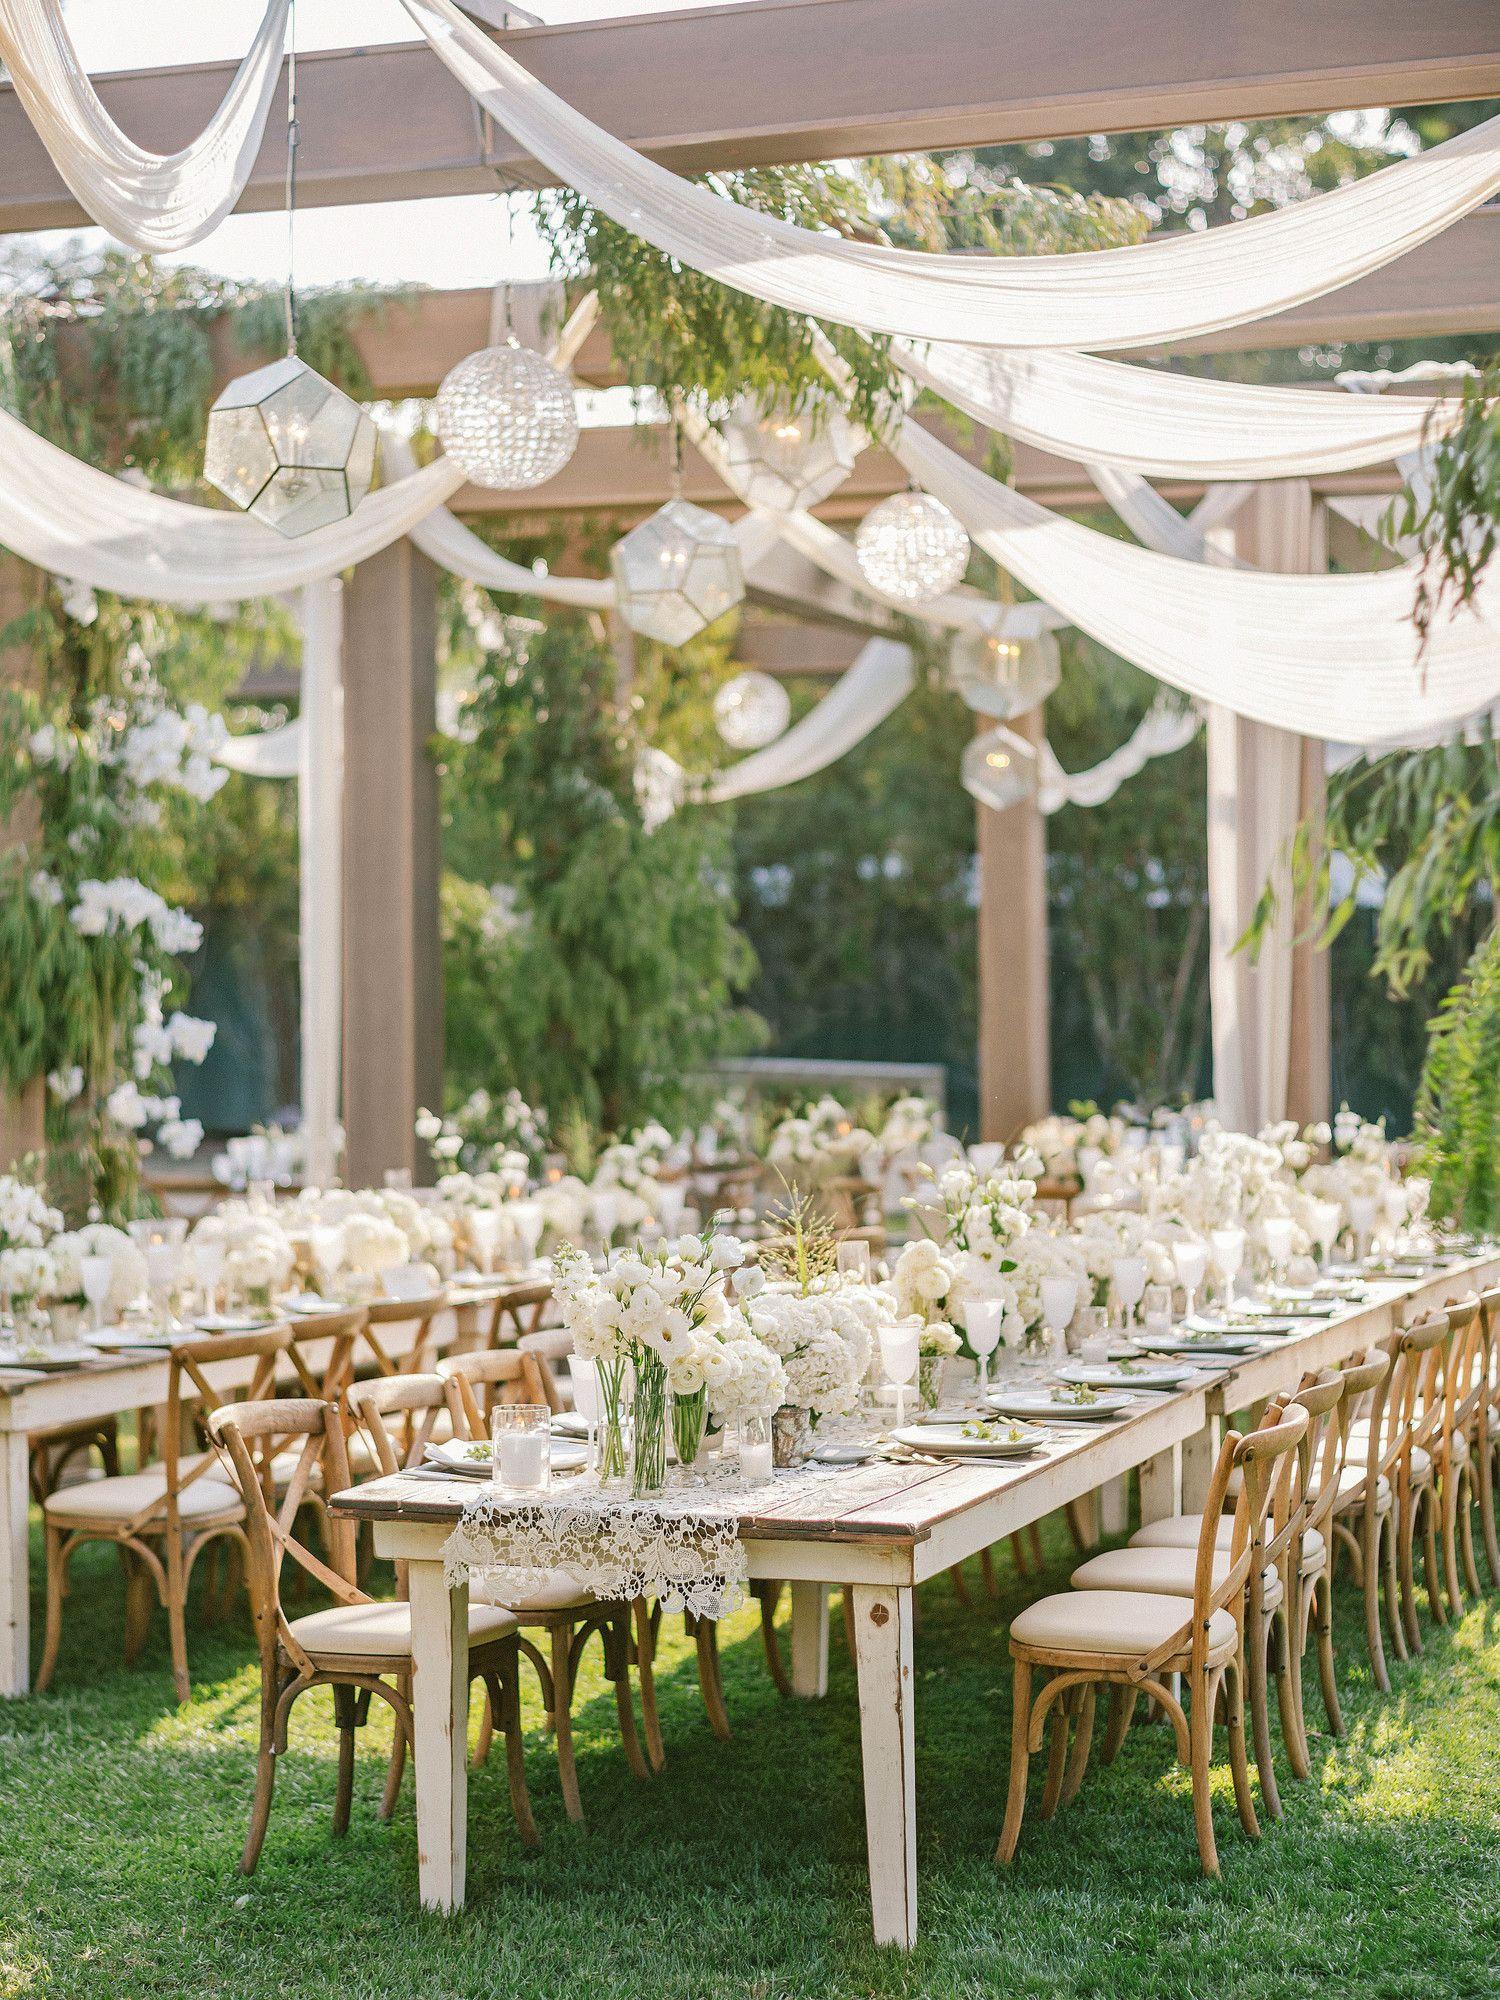 Pergolas Draped In Muslin Pepper Berry Feather Eucalyptus And White Bougainvillea Defined The Rece Wedding Pergola Gazebo Wedding Wedding Backyard Reception